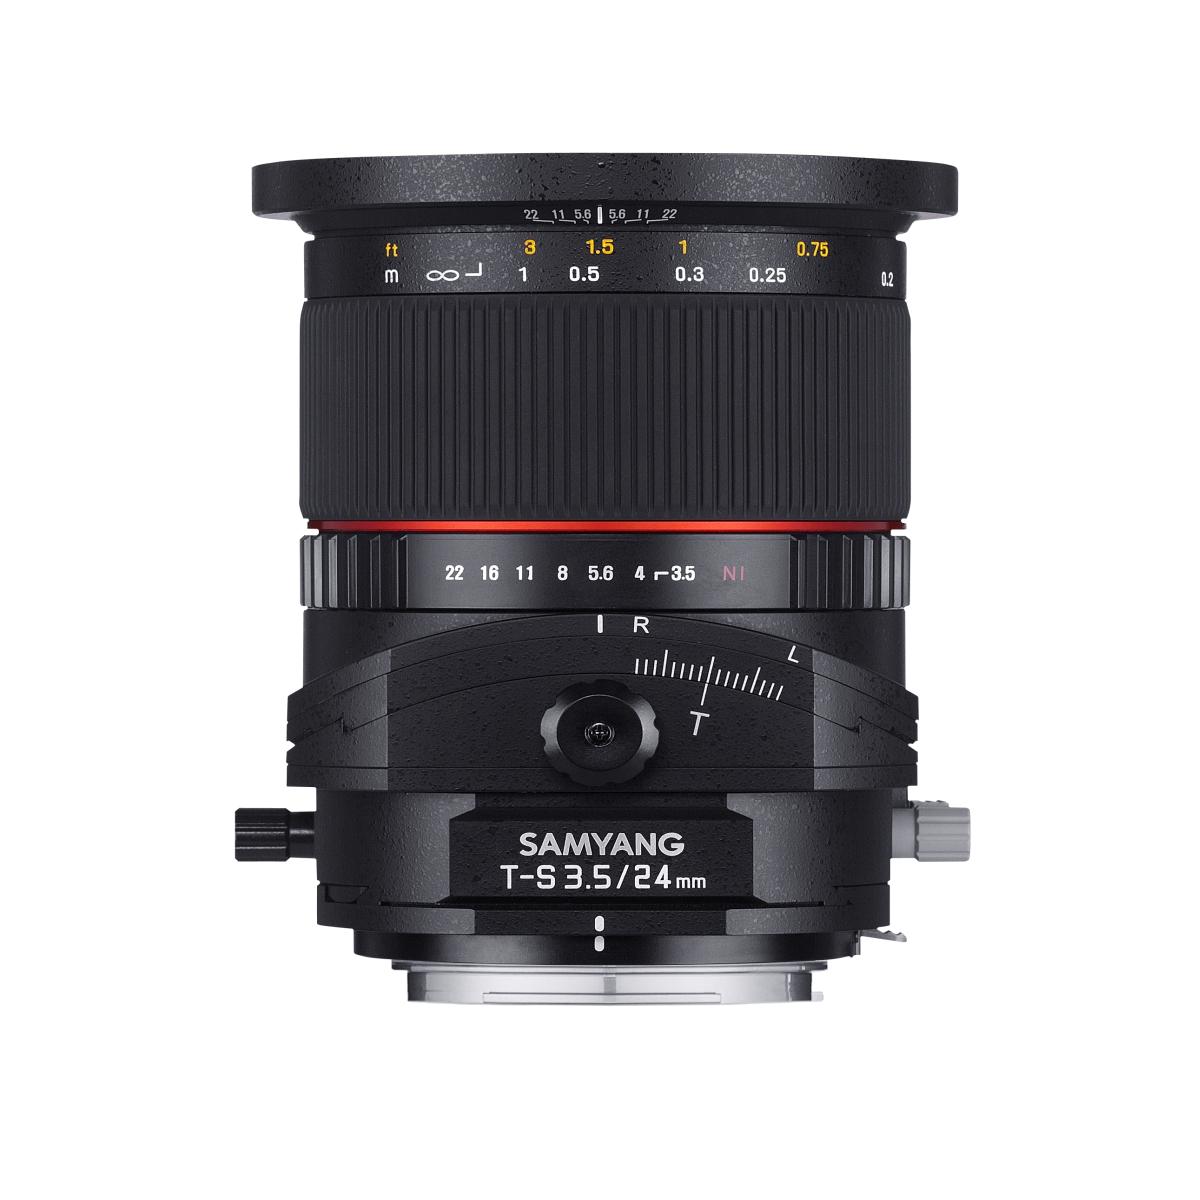 Samyang Tilt-Shift 24 mm 1:3,5 für MFT